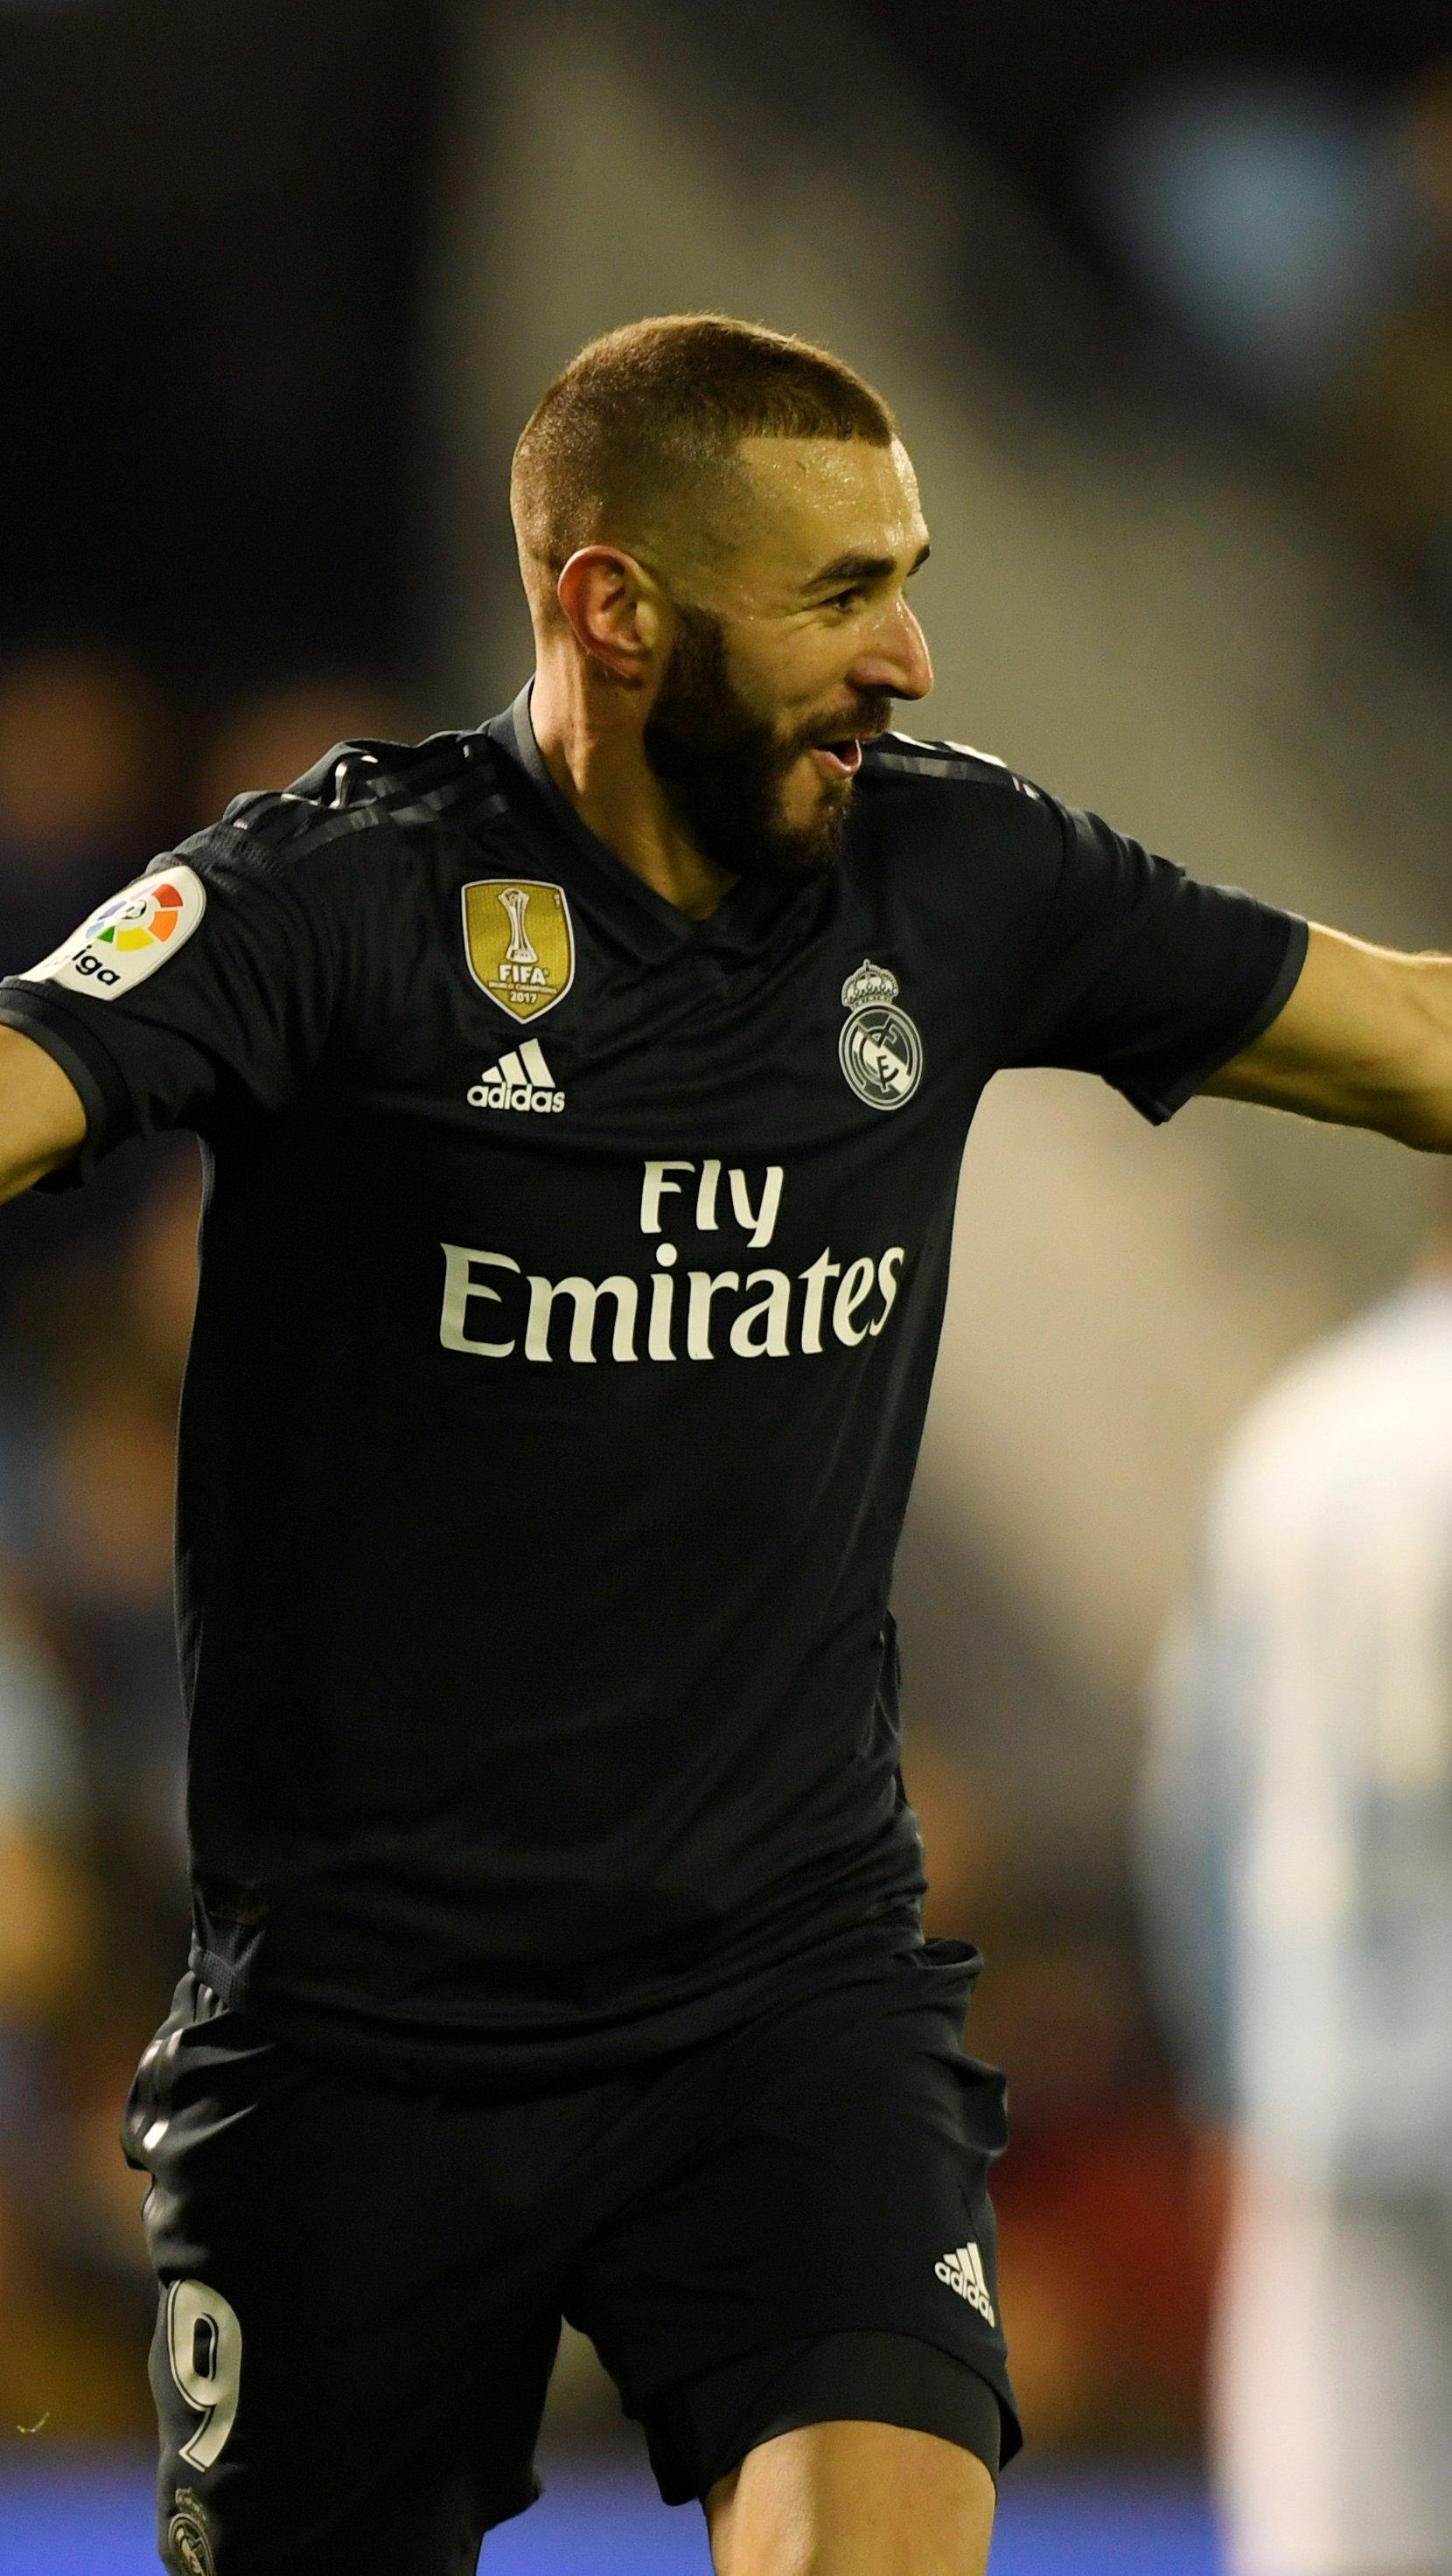 Wallpaper Karim Benzema with black Real Madrid jersey Vertical